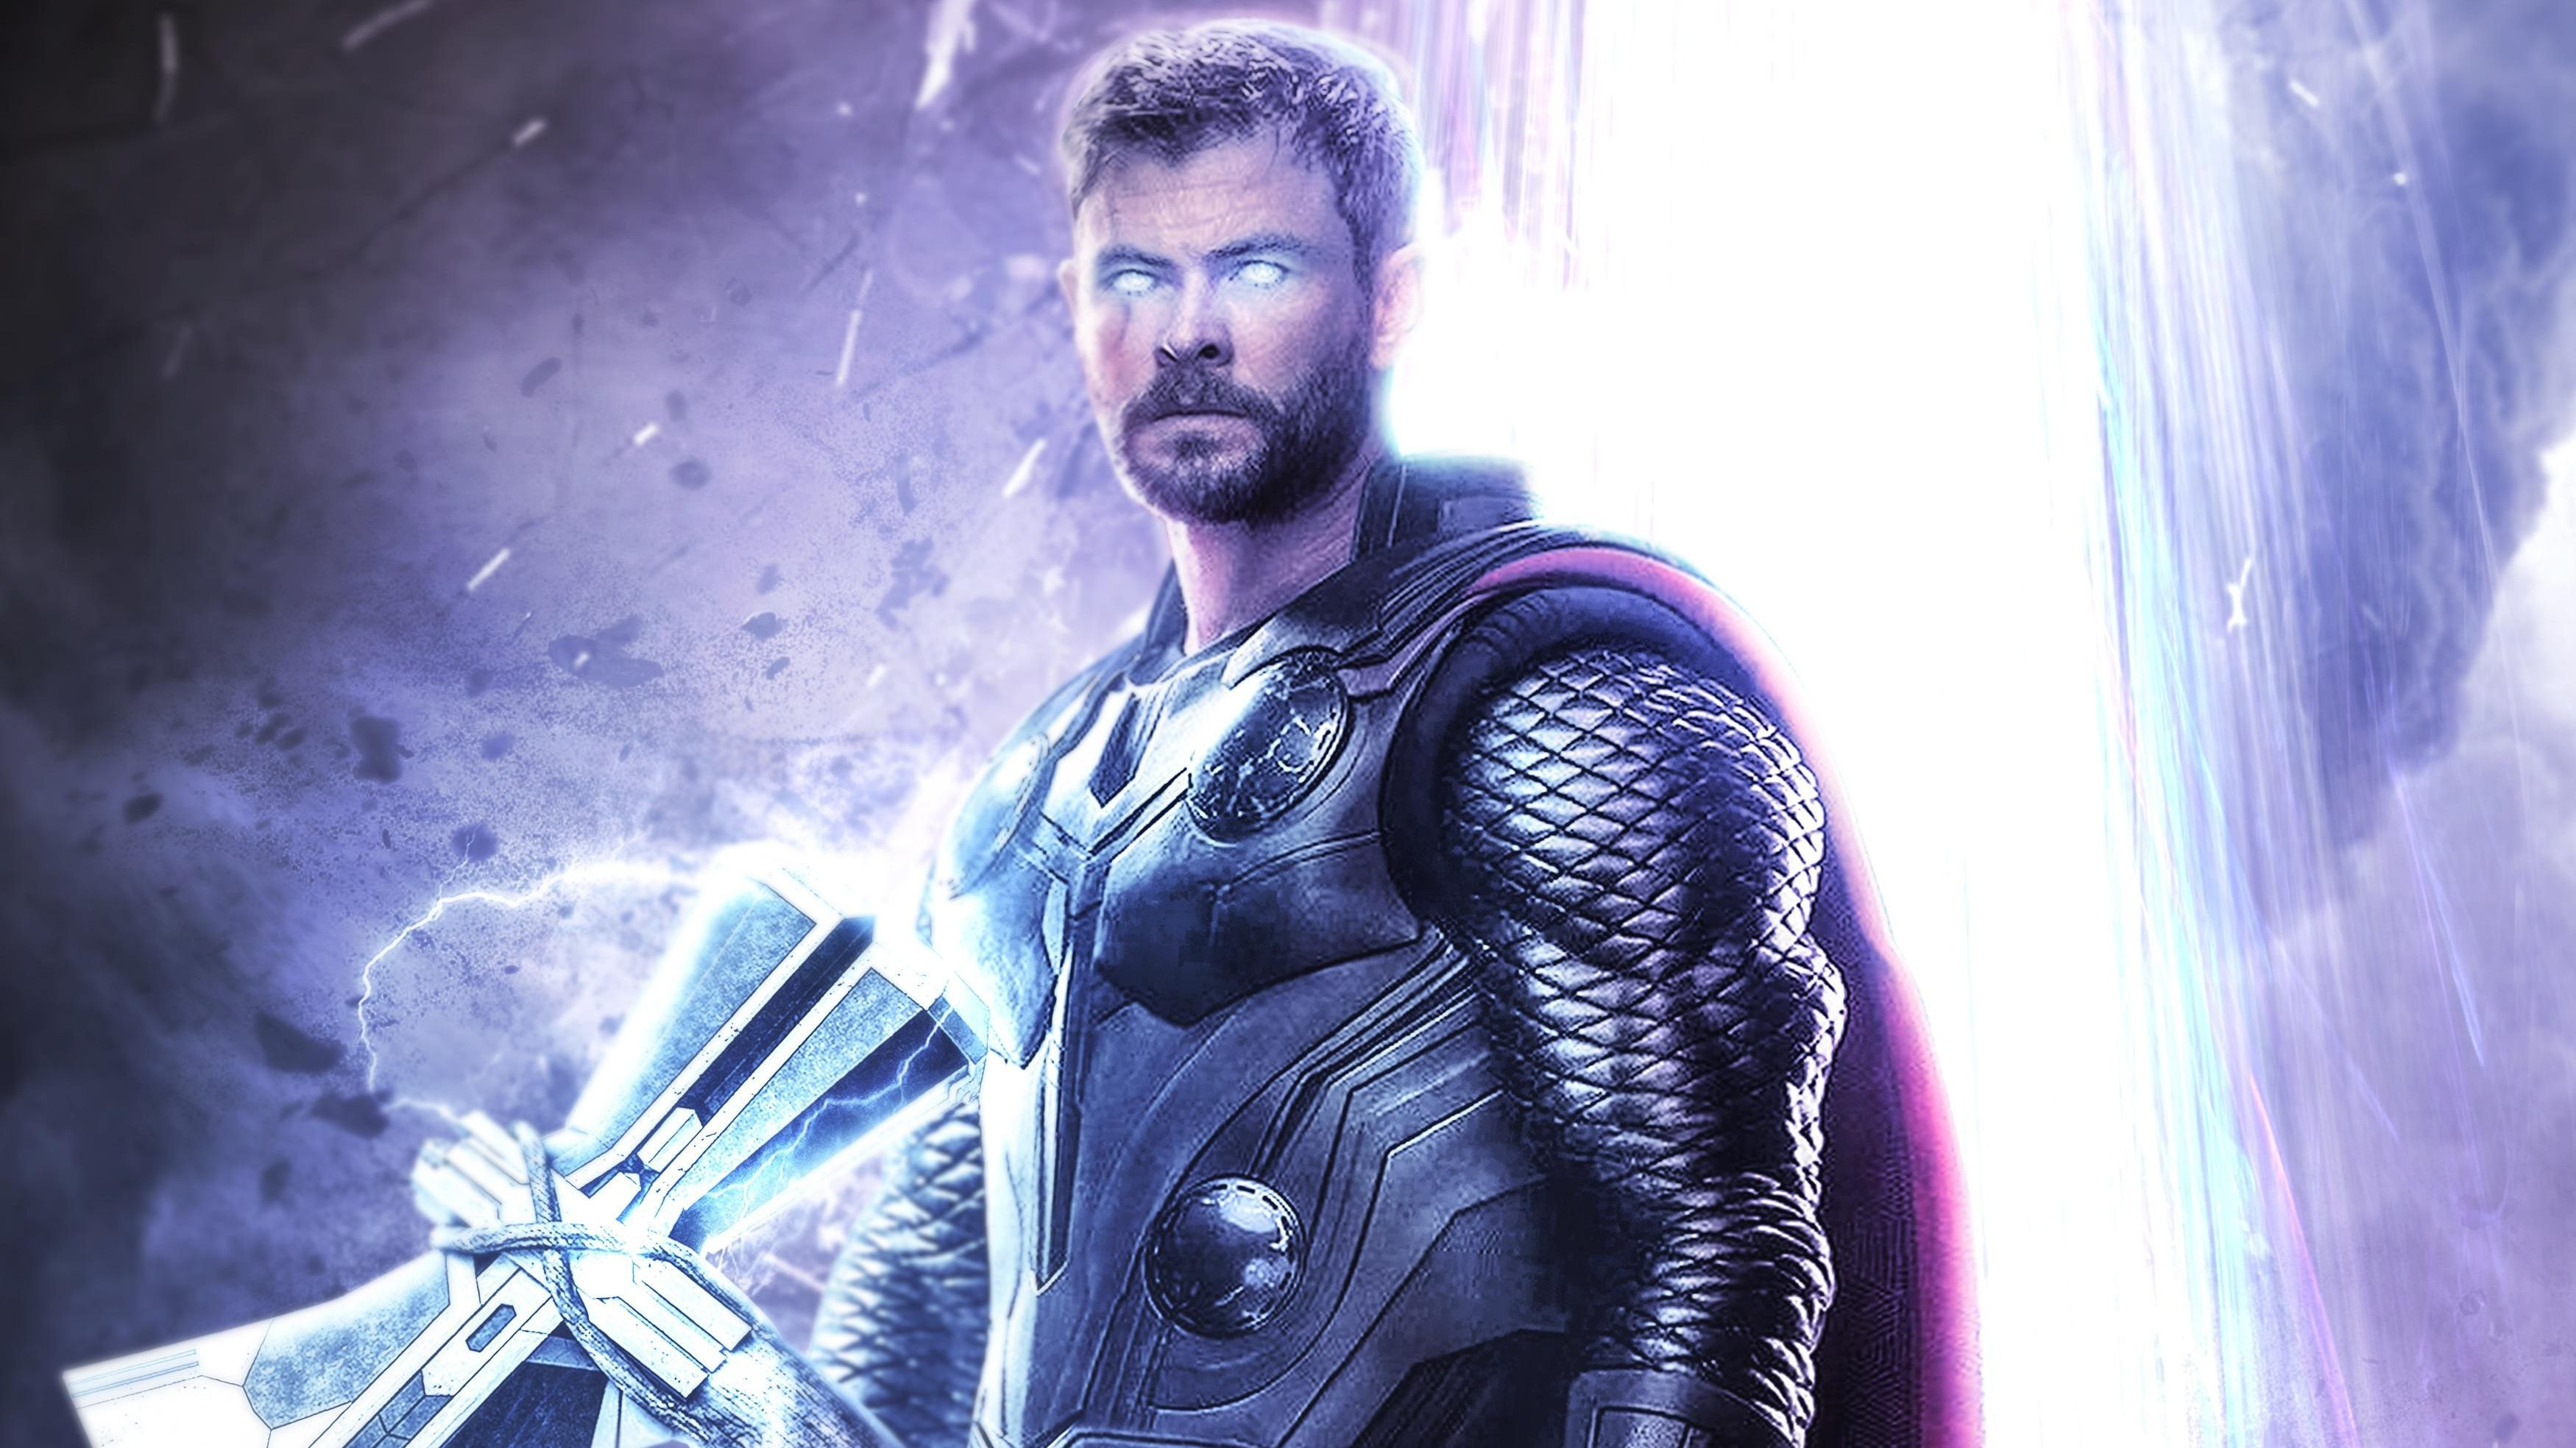 Thor Endgame Wallpapers Top Free Thor Endgame Backgrounds